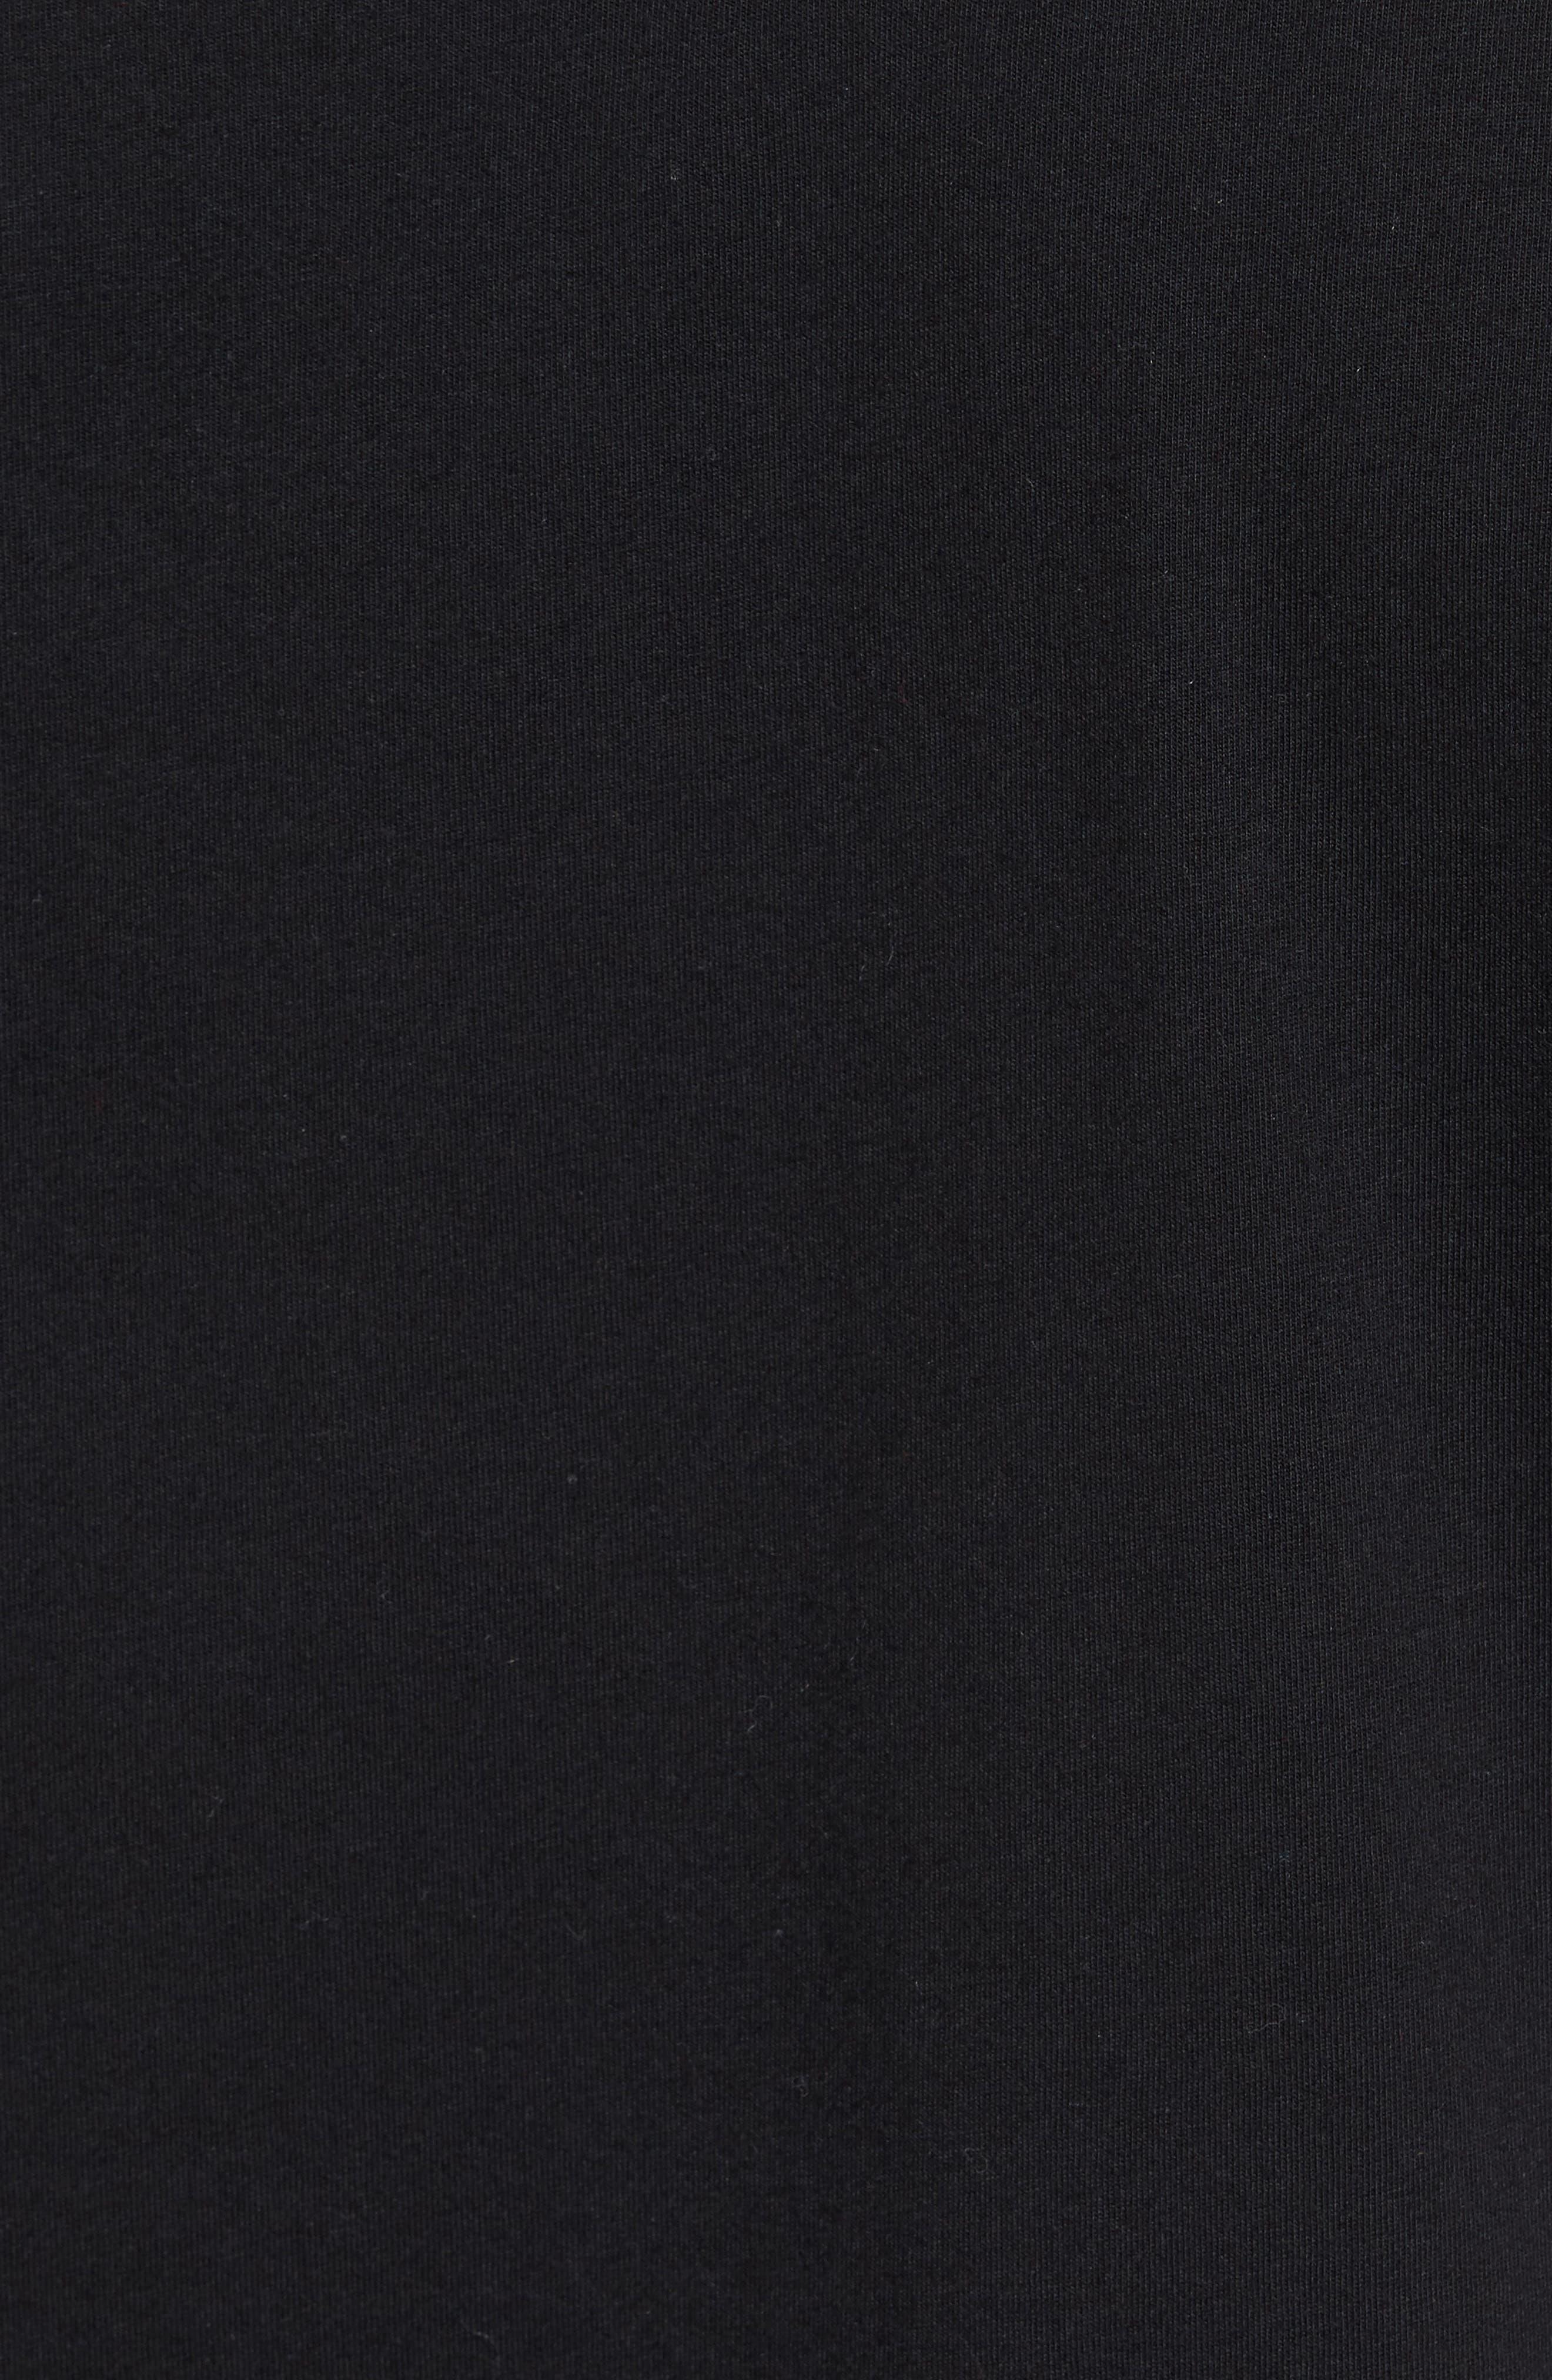 Sportswear AJ11 CNXN Graphic T-Shirt,                             Alternate thumbnail 5, color,                             010